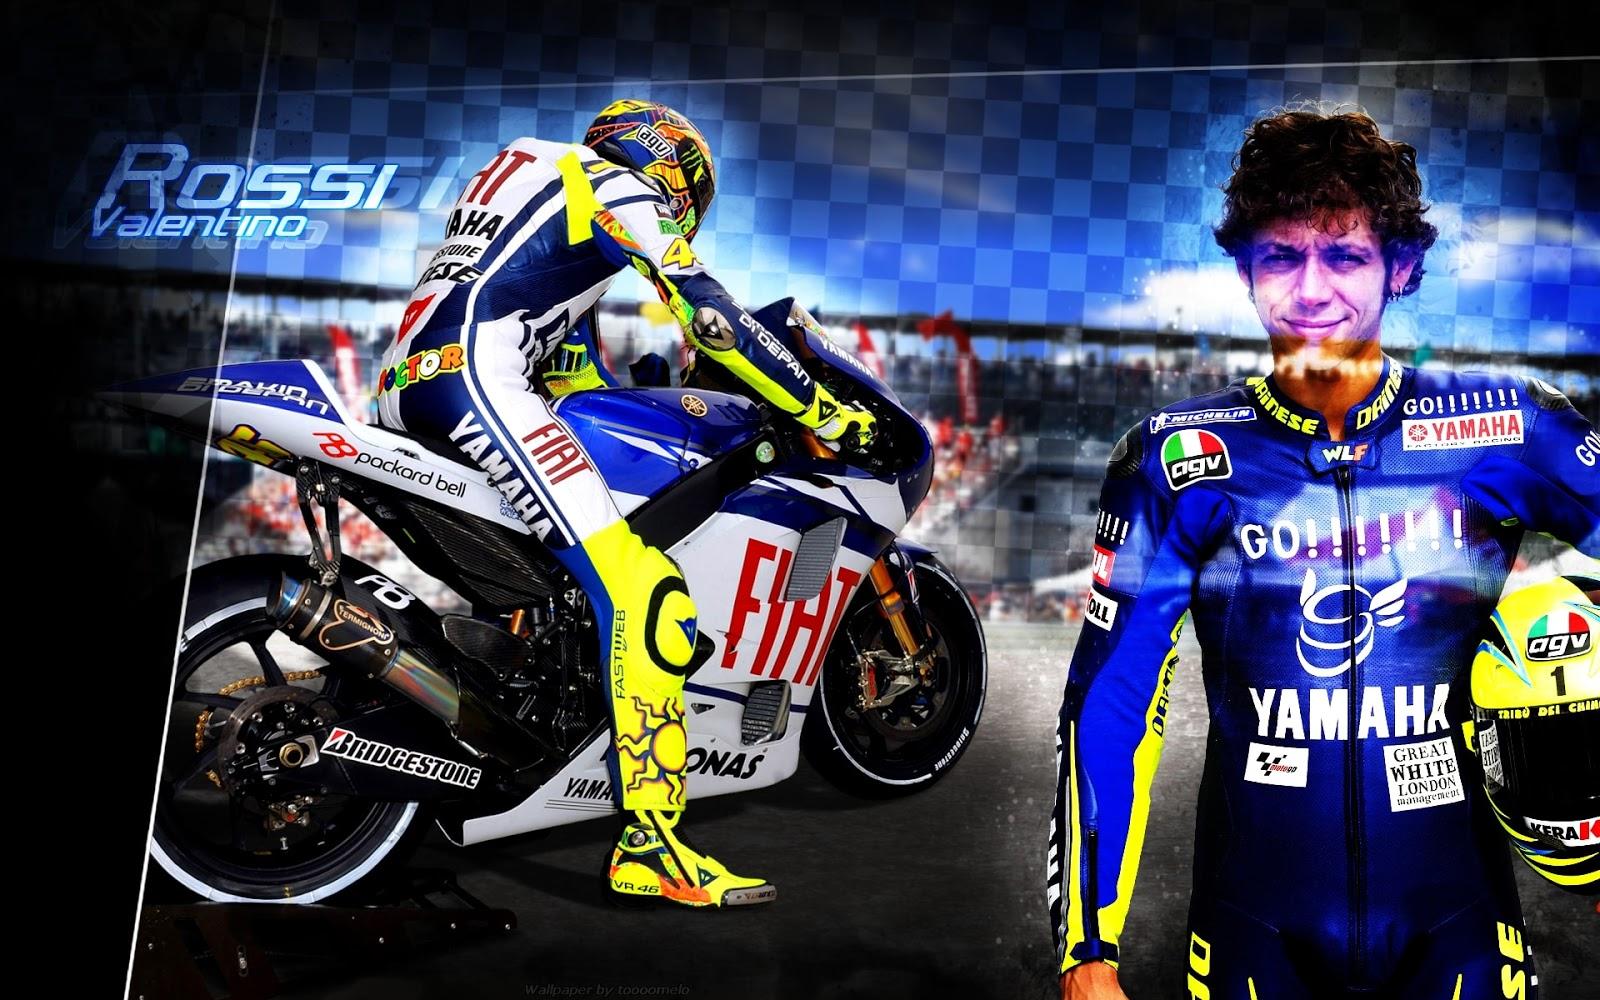 Kumpulan Foto Kartun Lucu Valentino Rossi Gambar Gokil